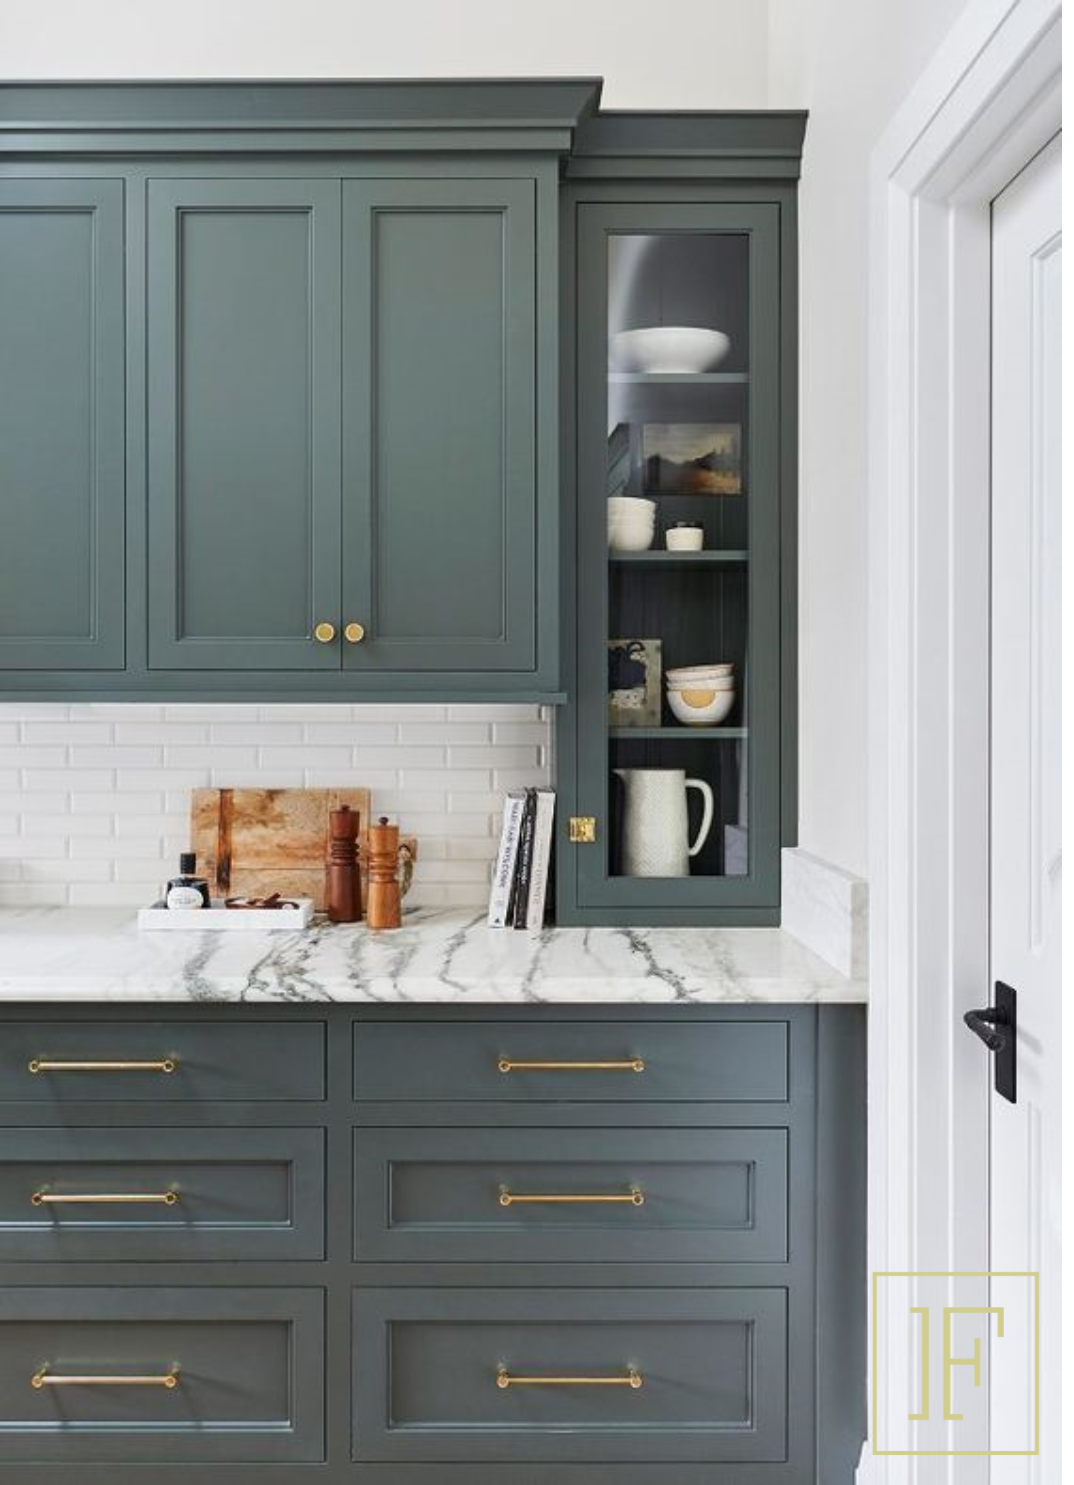 Matte Green Cabinets | Green kitchen cabinets, New kitchen ...